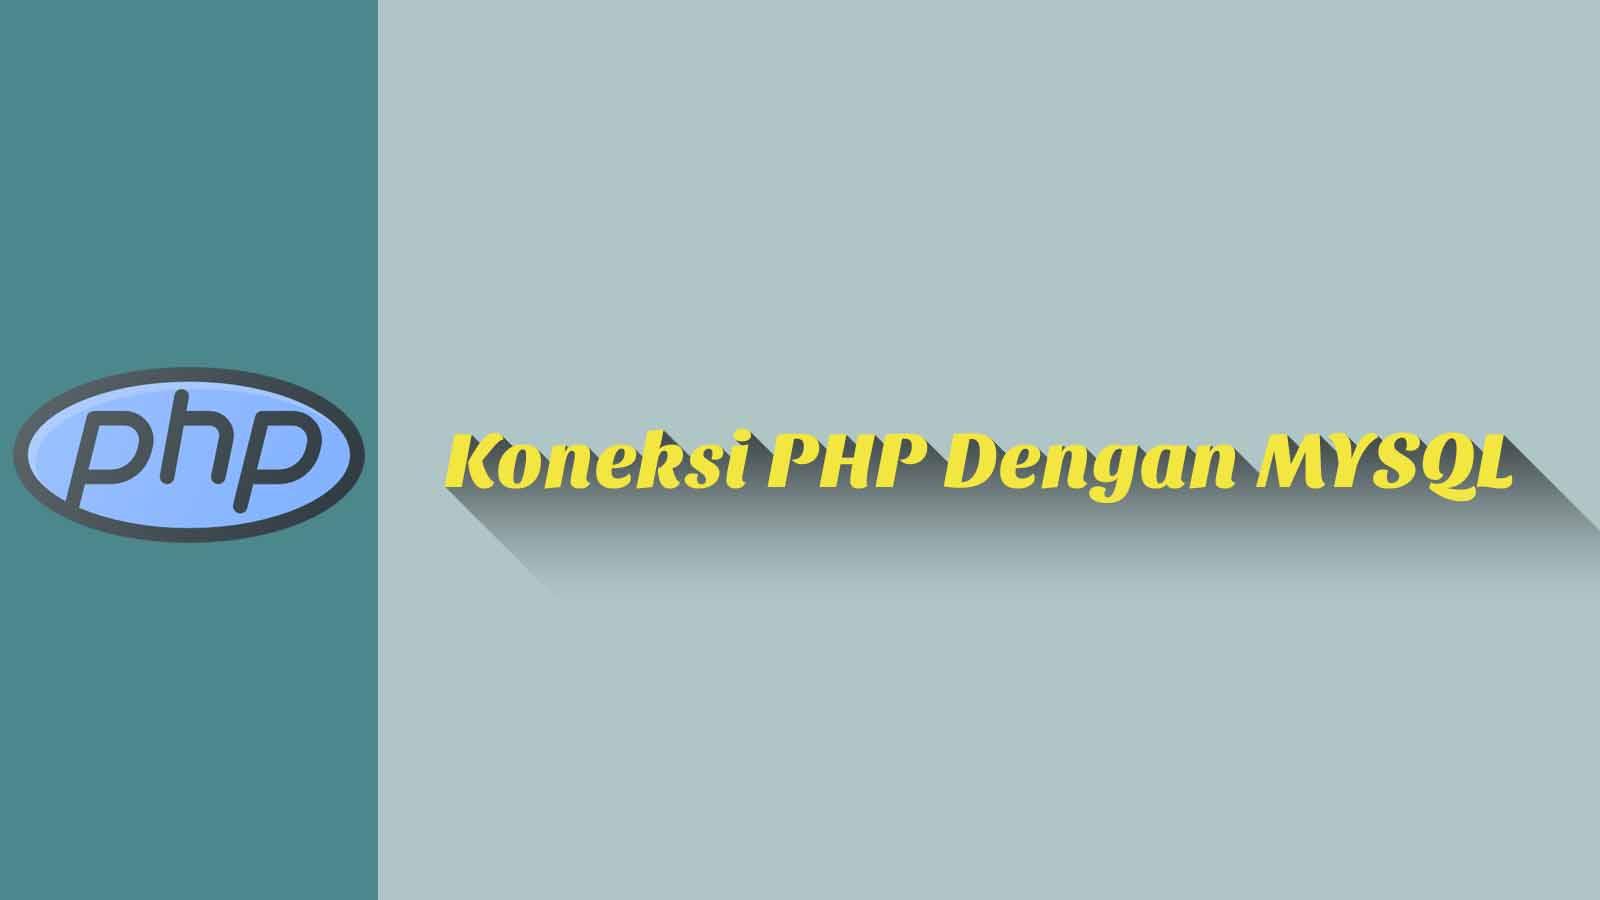 Koneksi PHP Dengan MYSQL